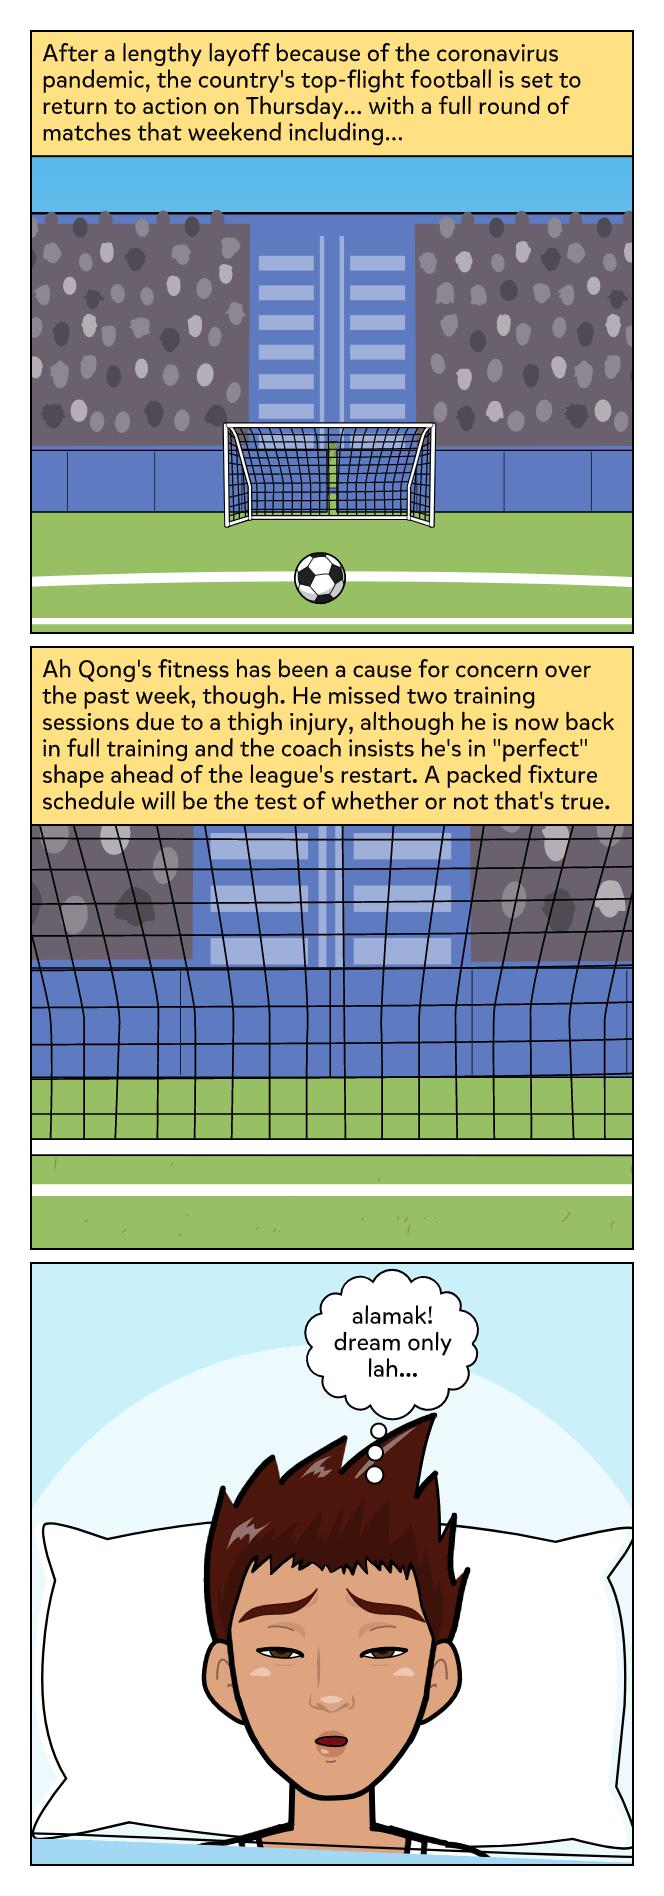 Ah Qong - The Football Fan (04)